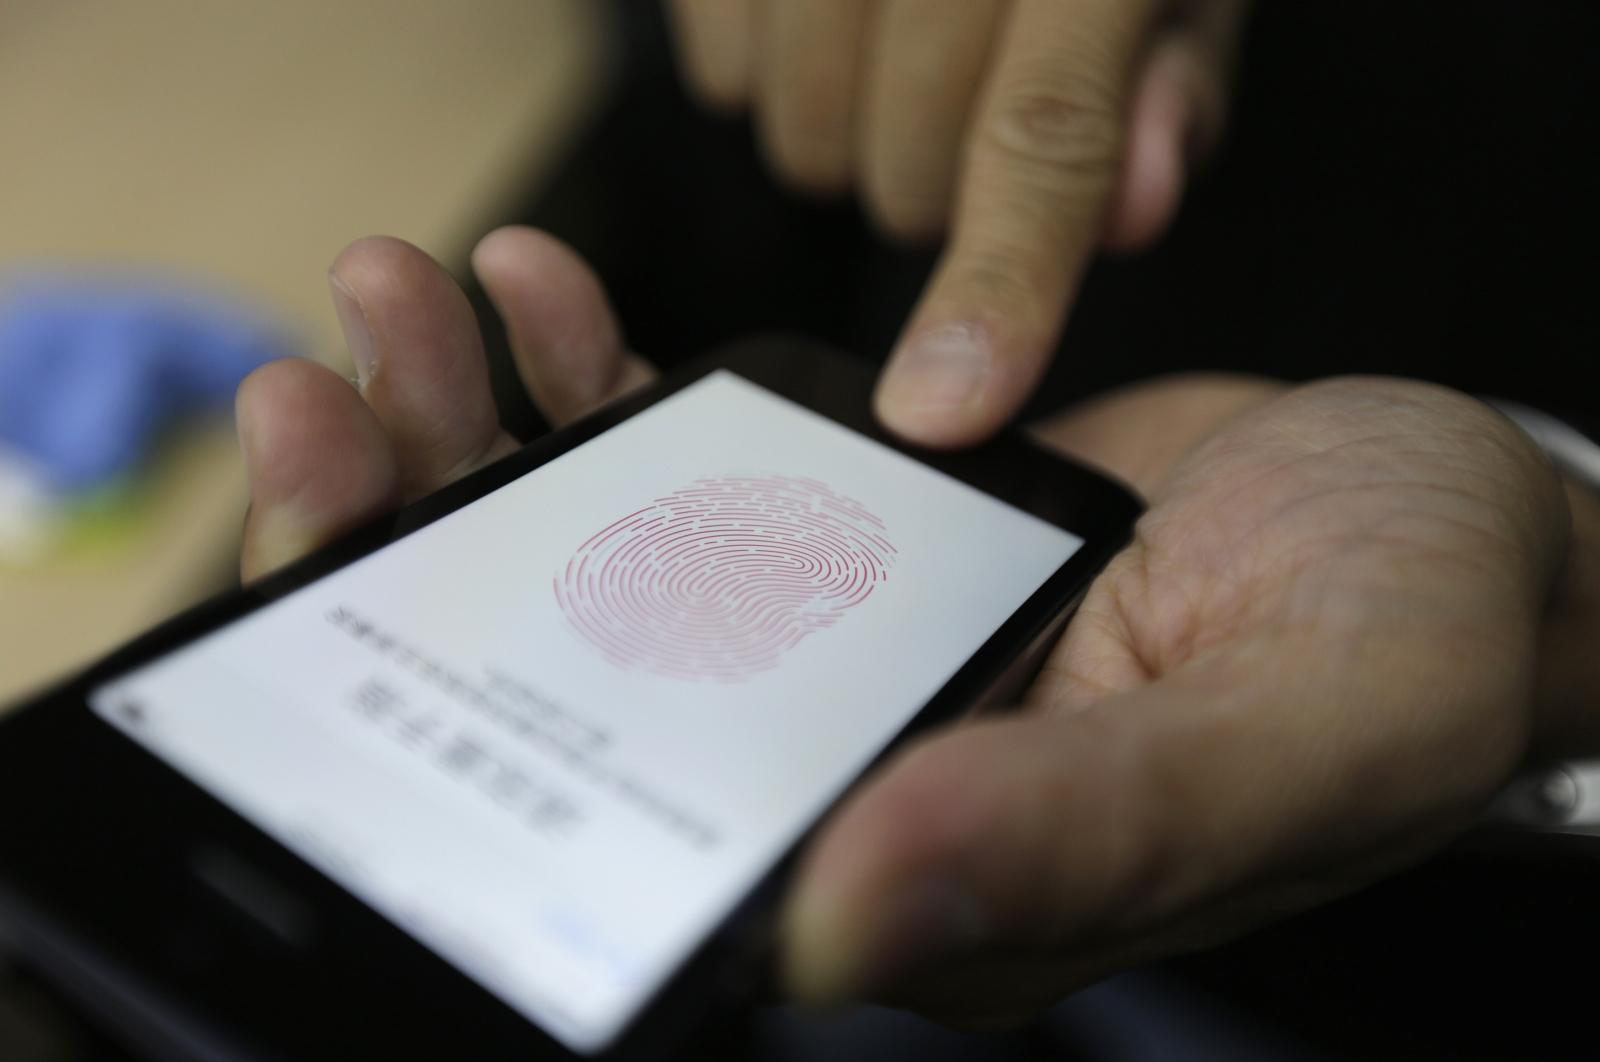 Fingerprint recognition phone